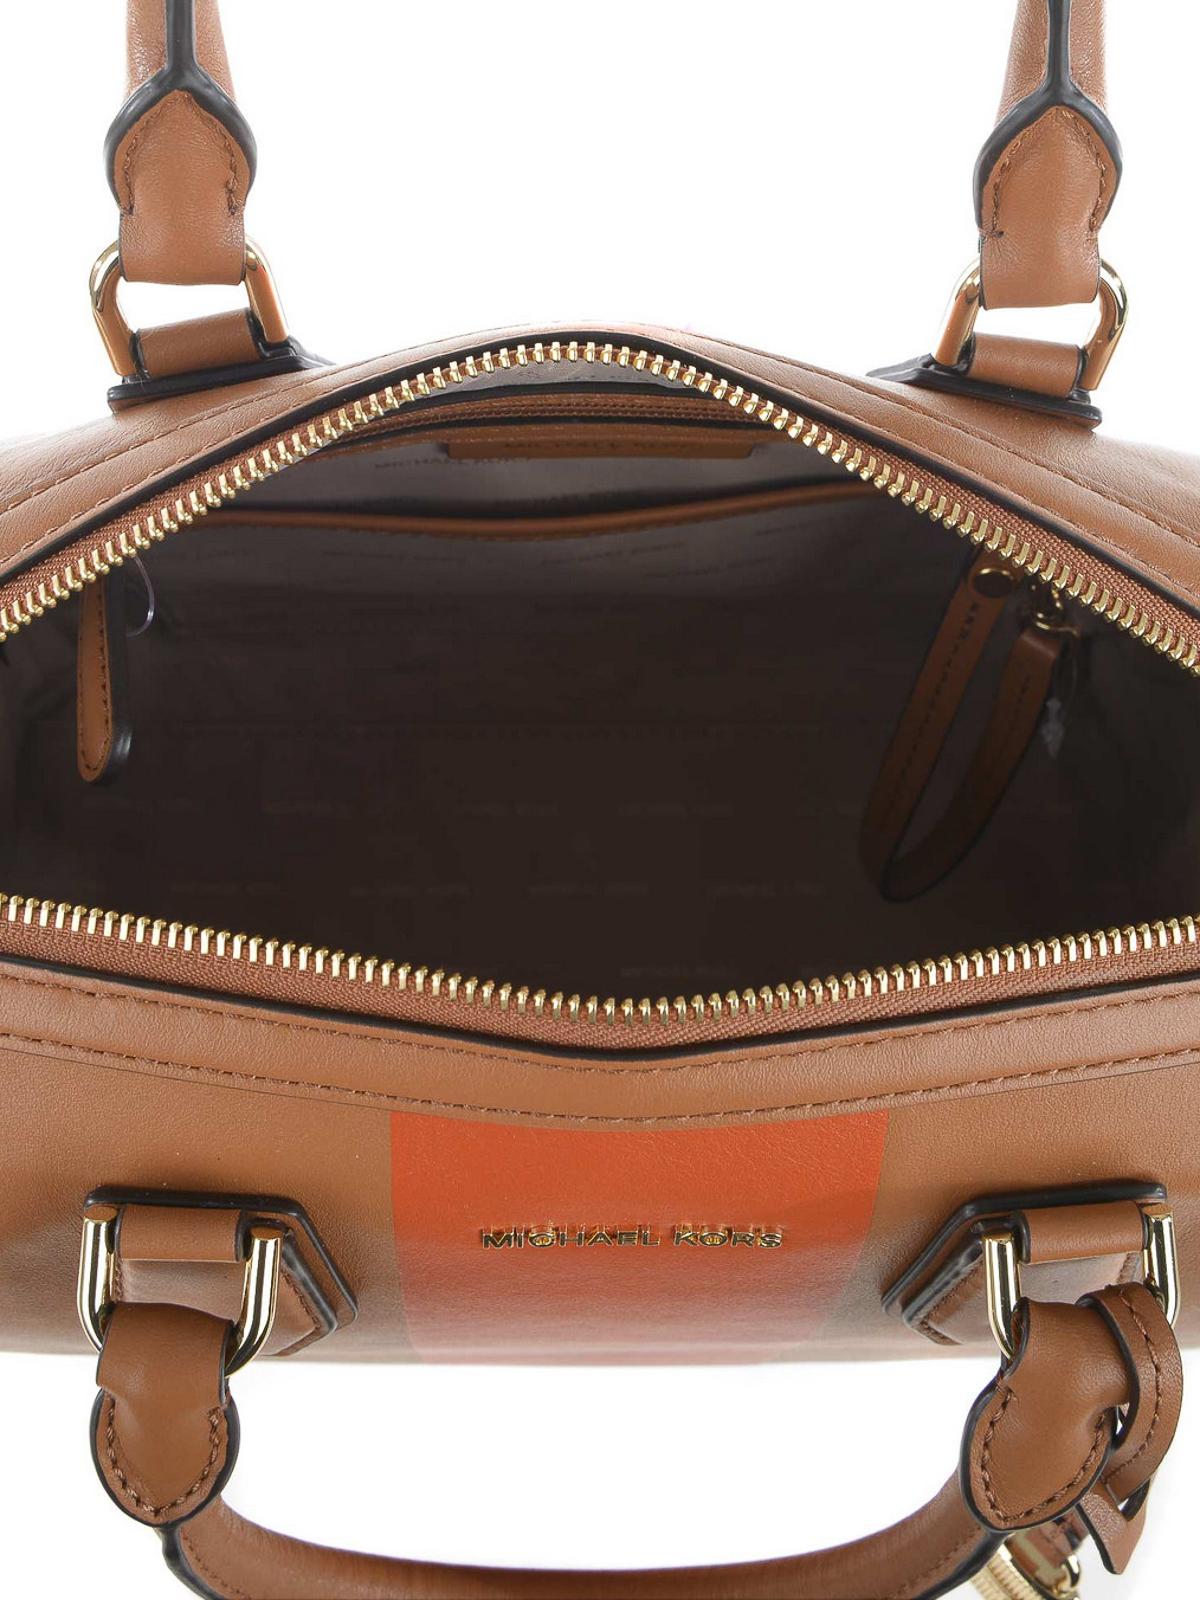 michael kors medium mercer bowling bag bowling bags. Black Bedroom Furniture Sets. Home Design Ideas